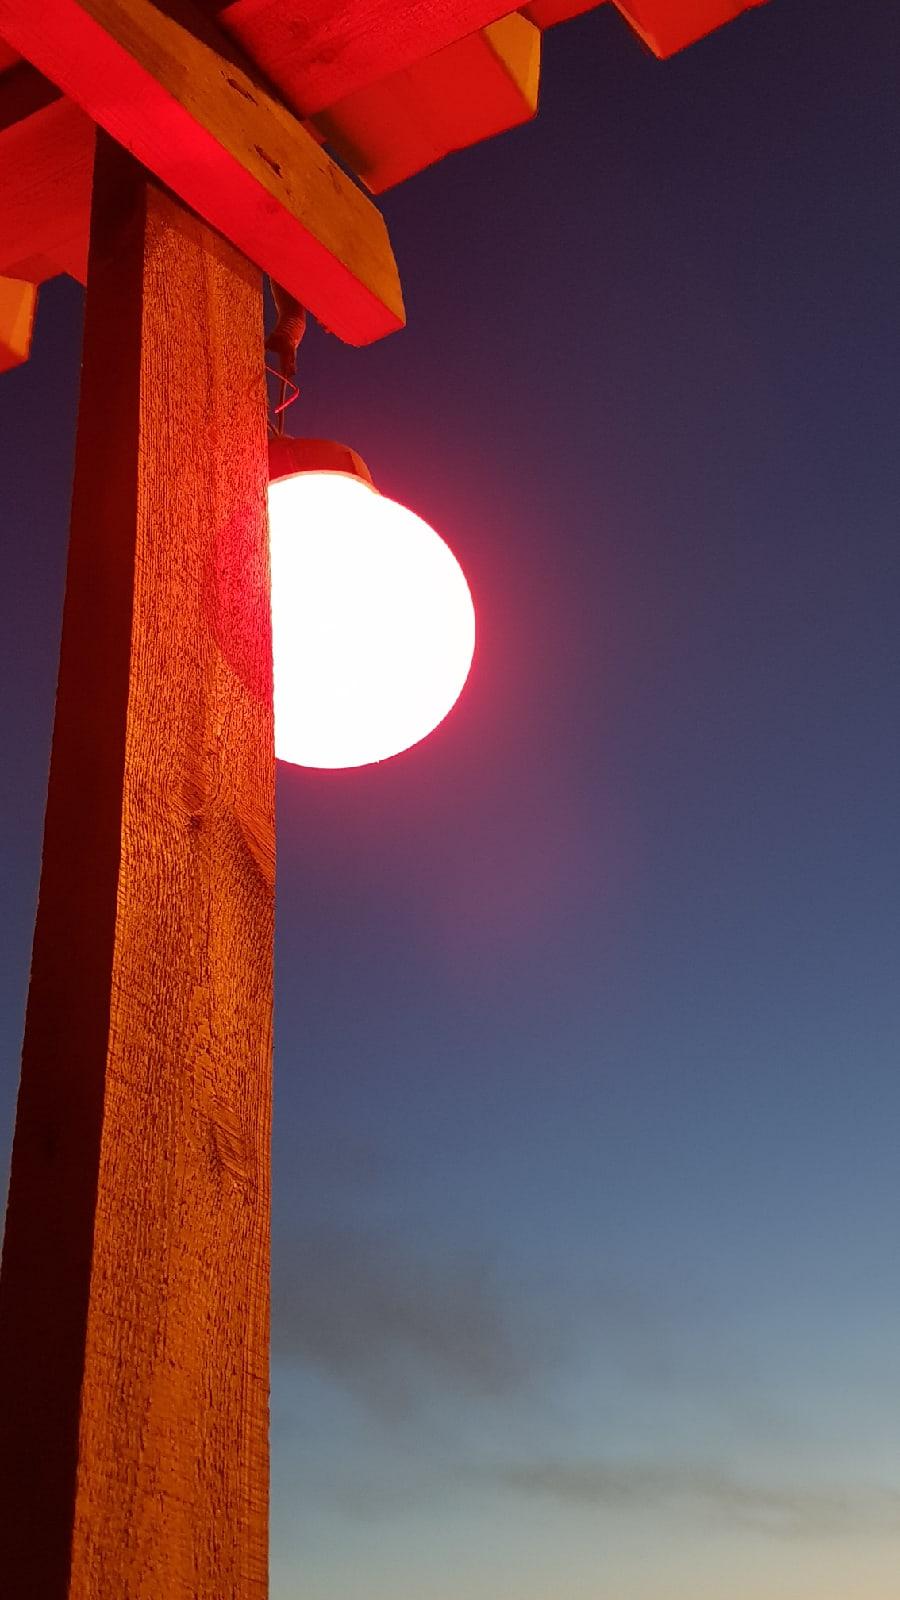 Питерский свет - Фото